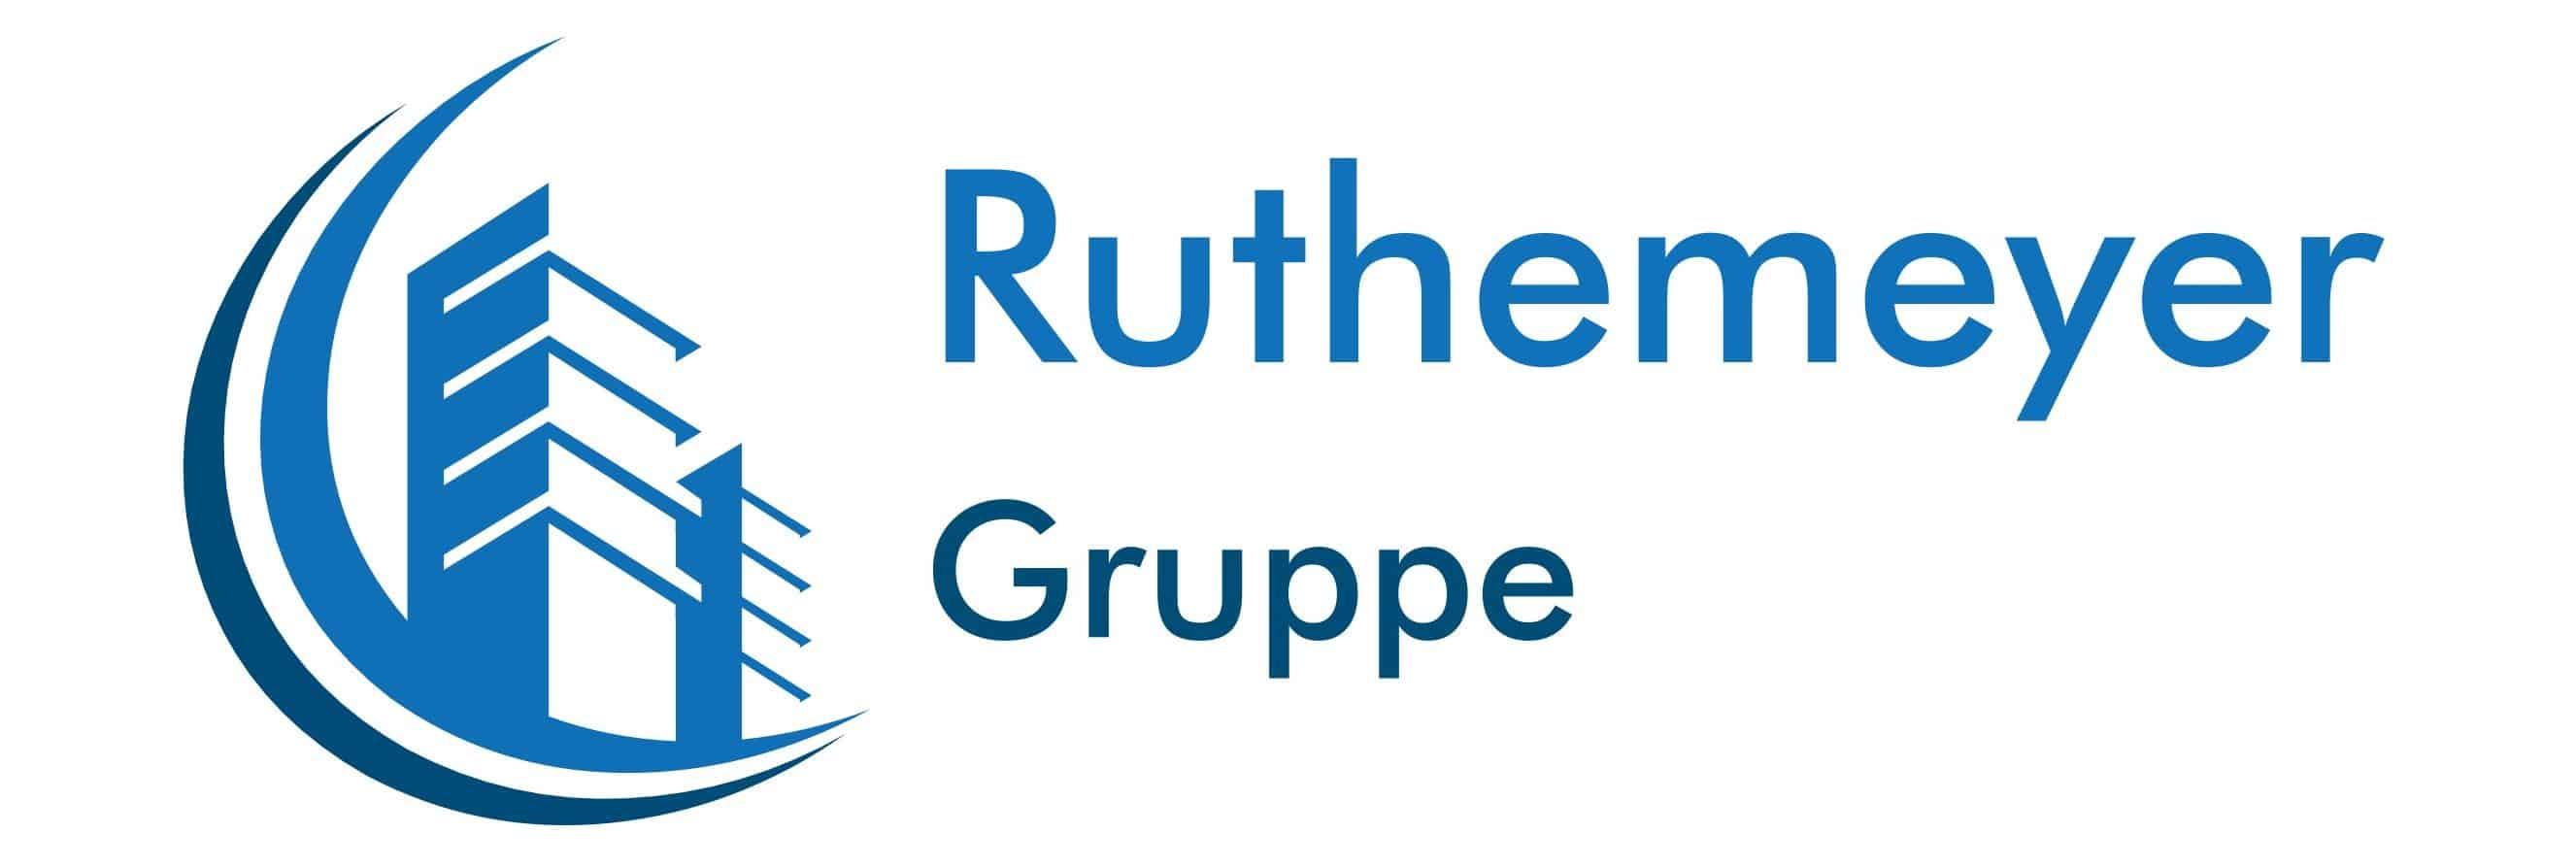 Ruthemeyer GmbH